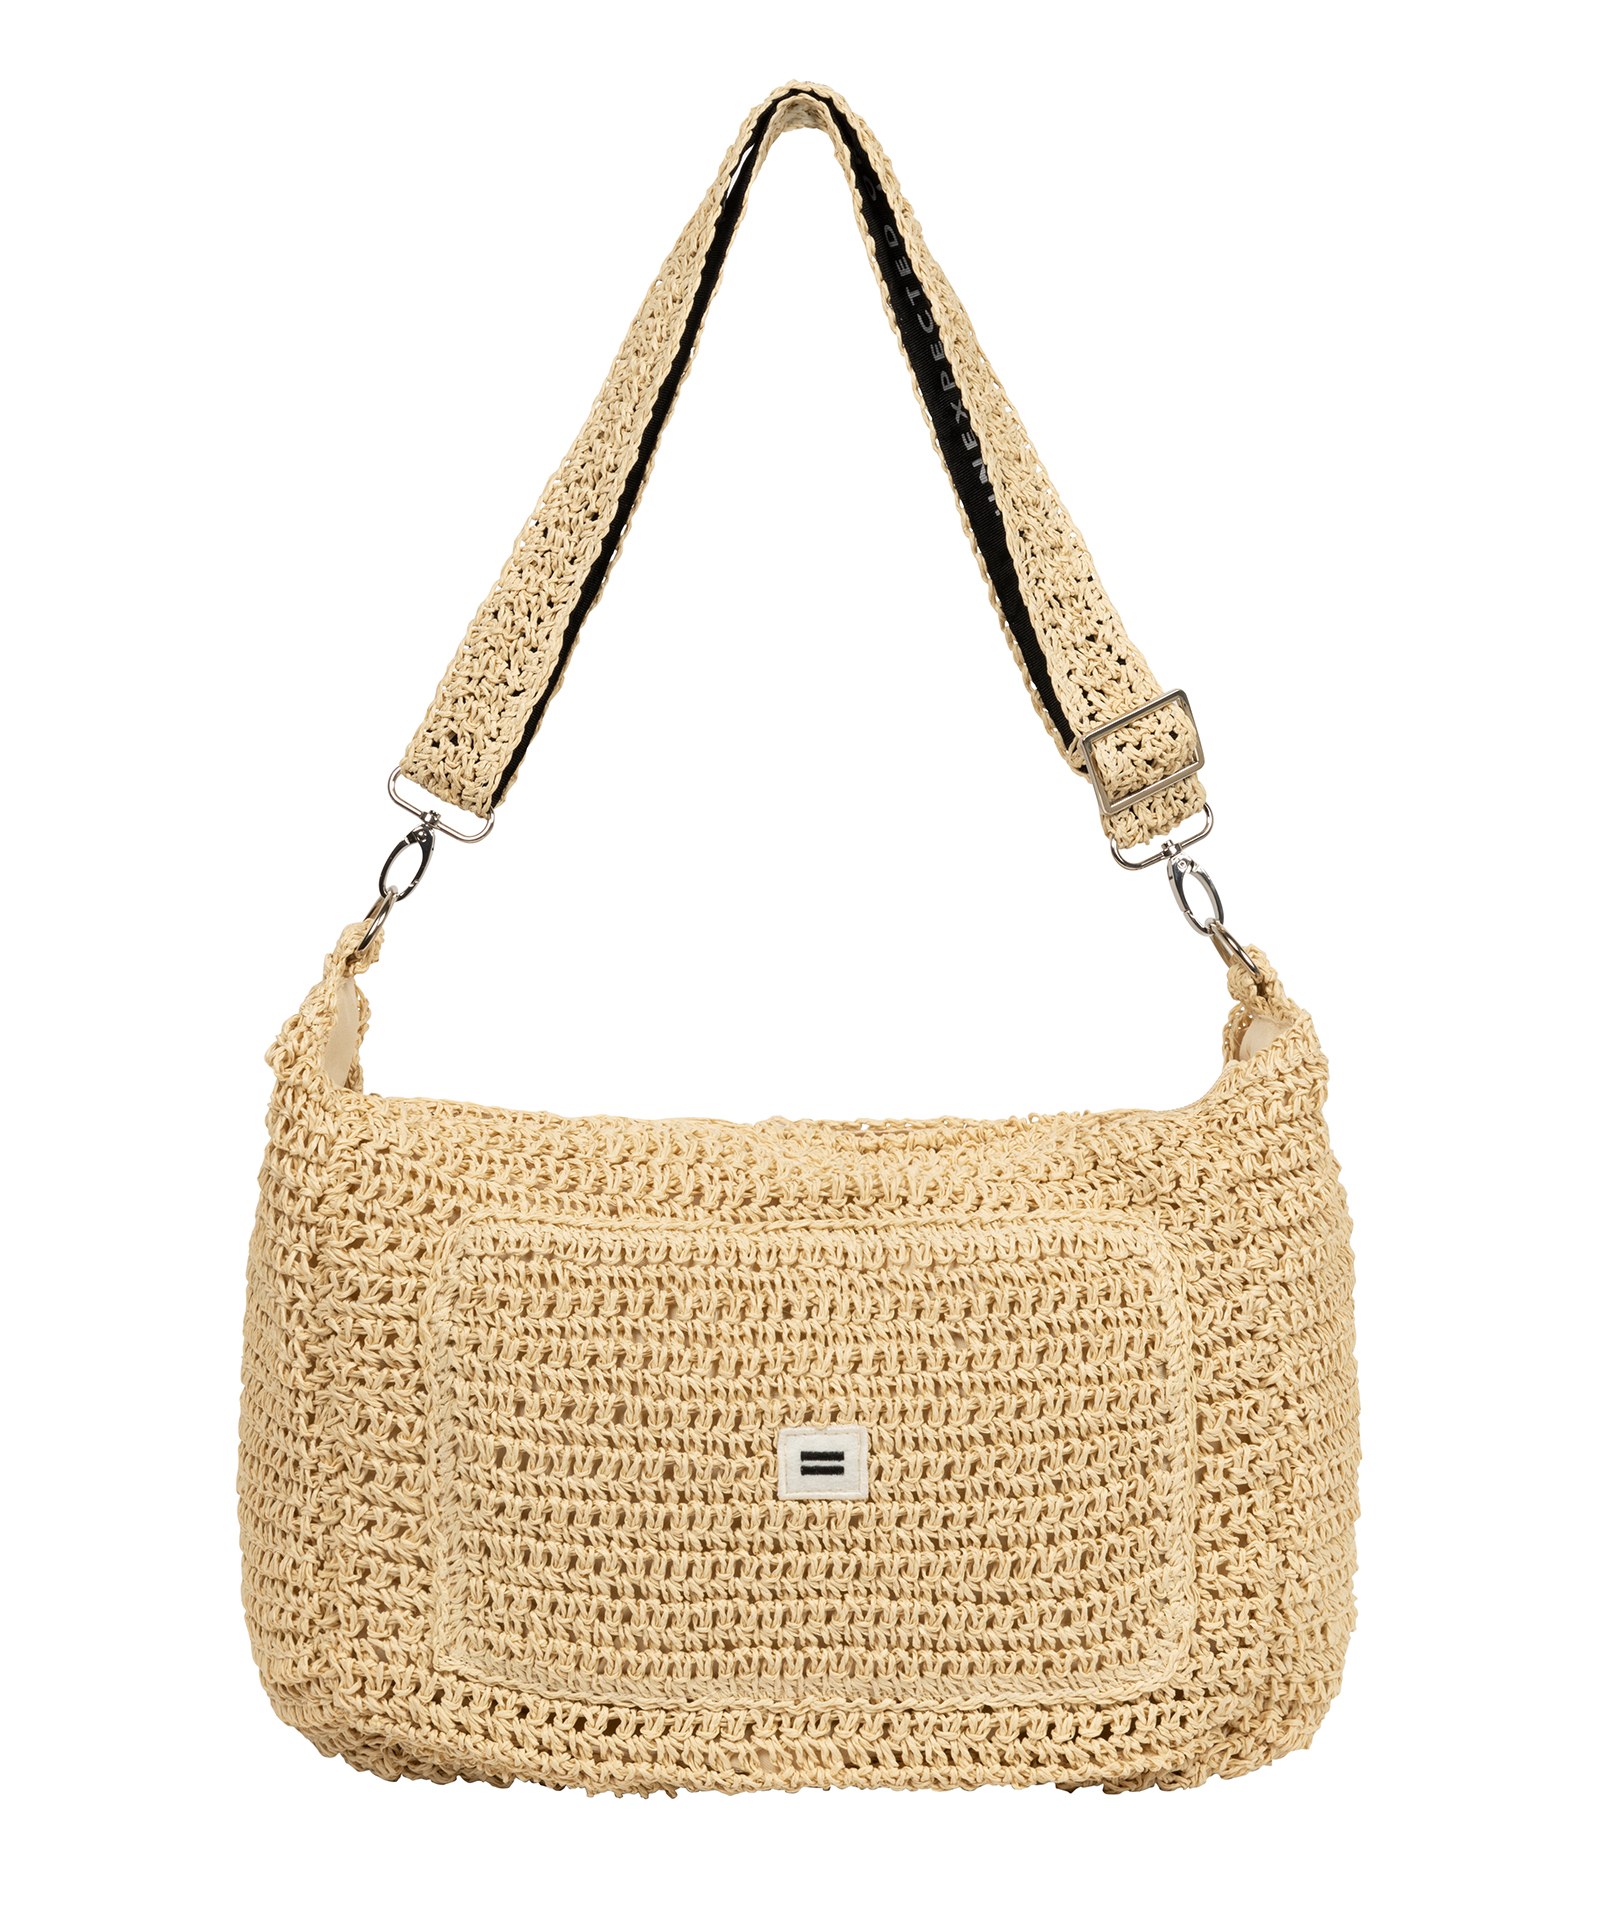 Small Weekend Bag Straw - Soft beige